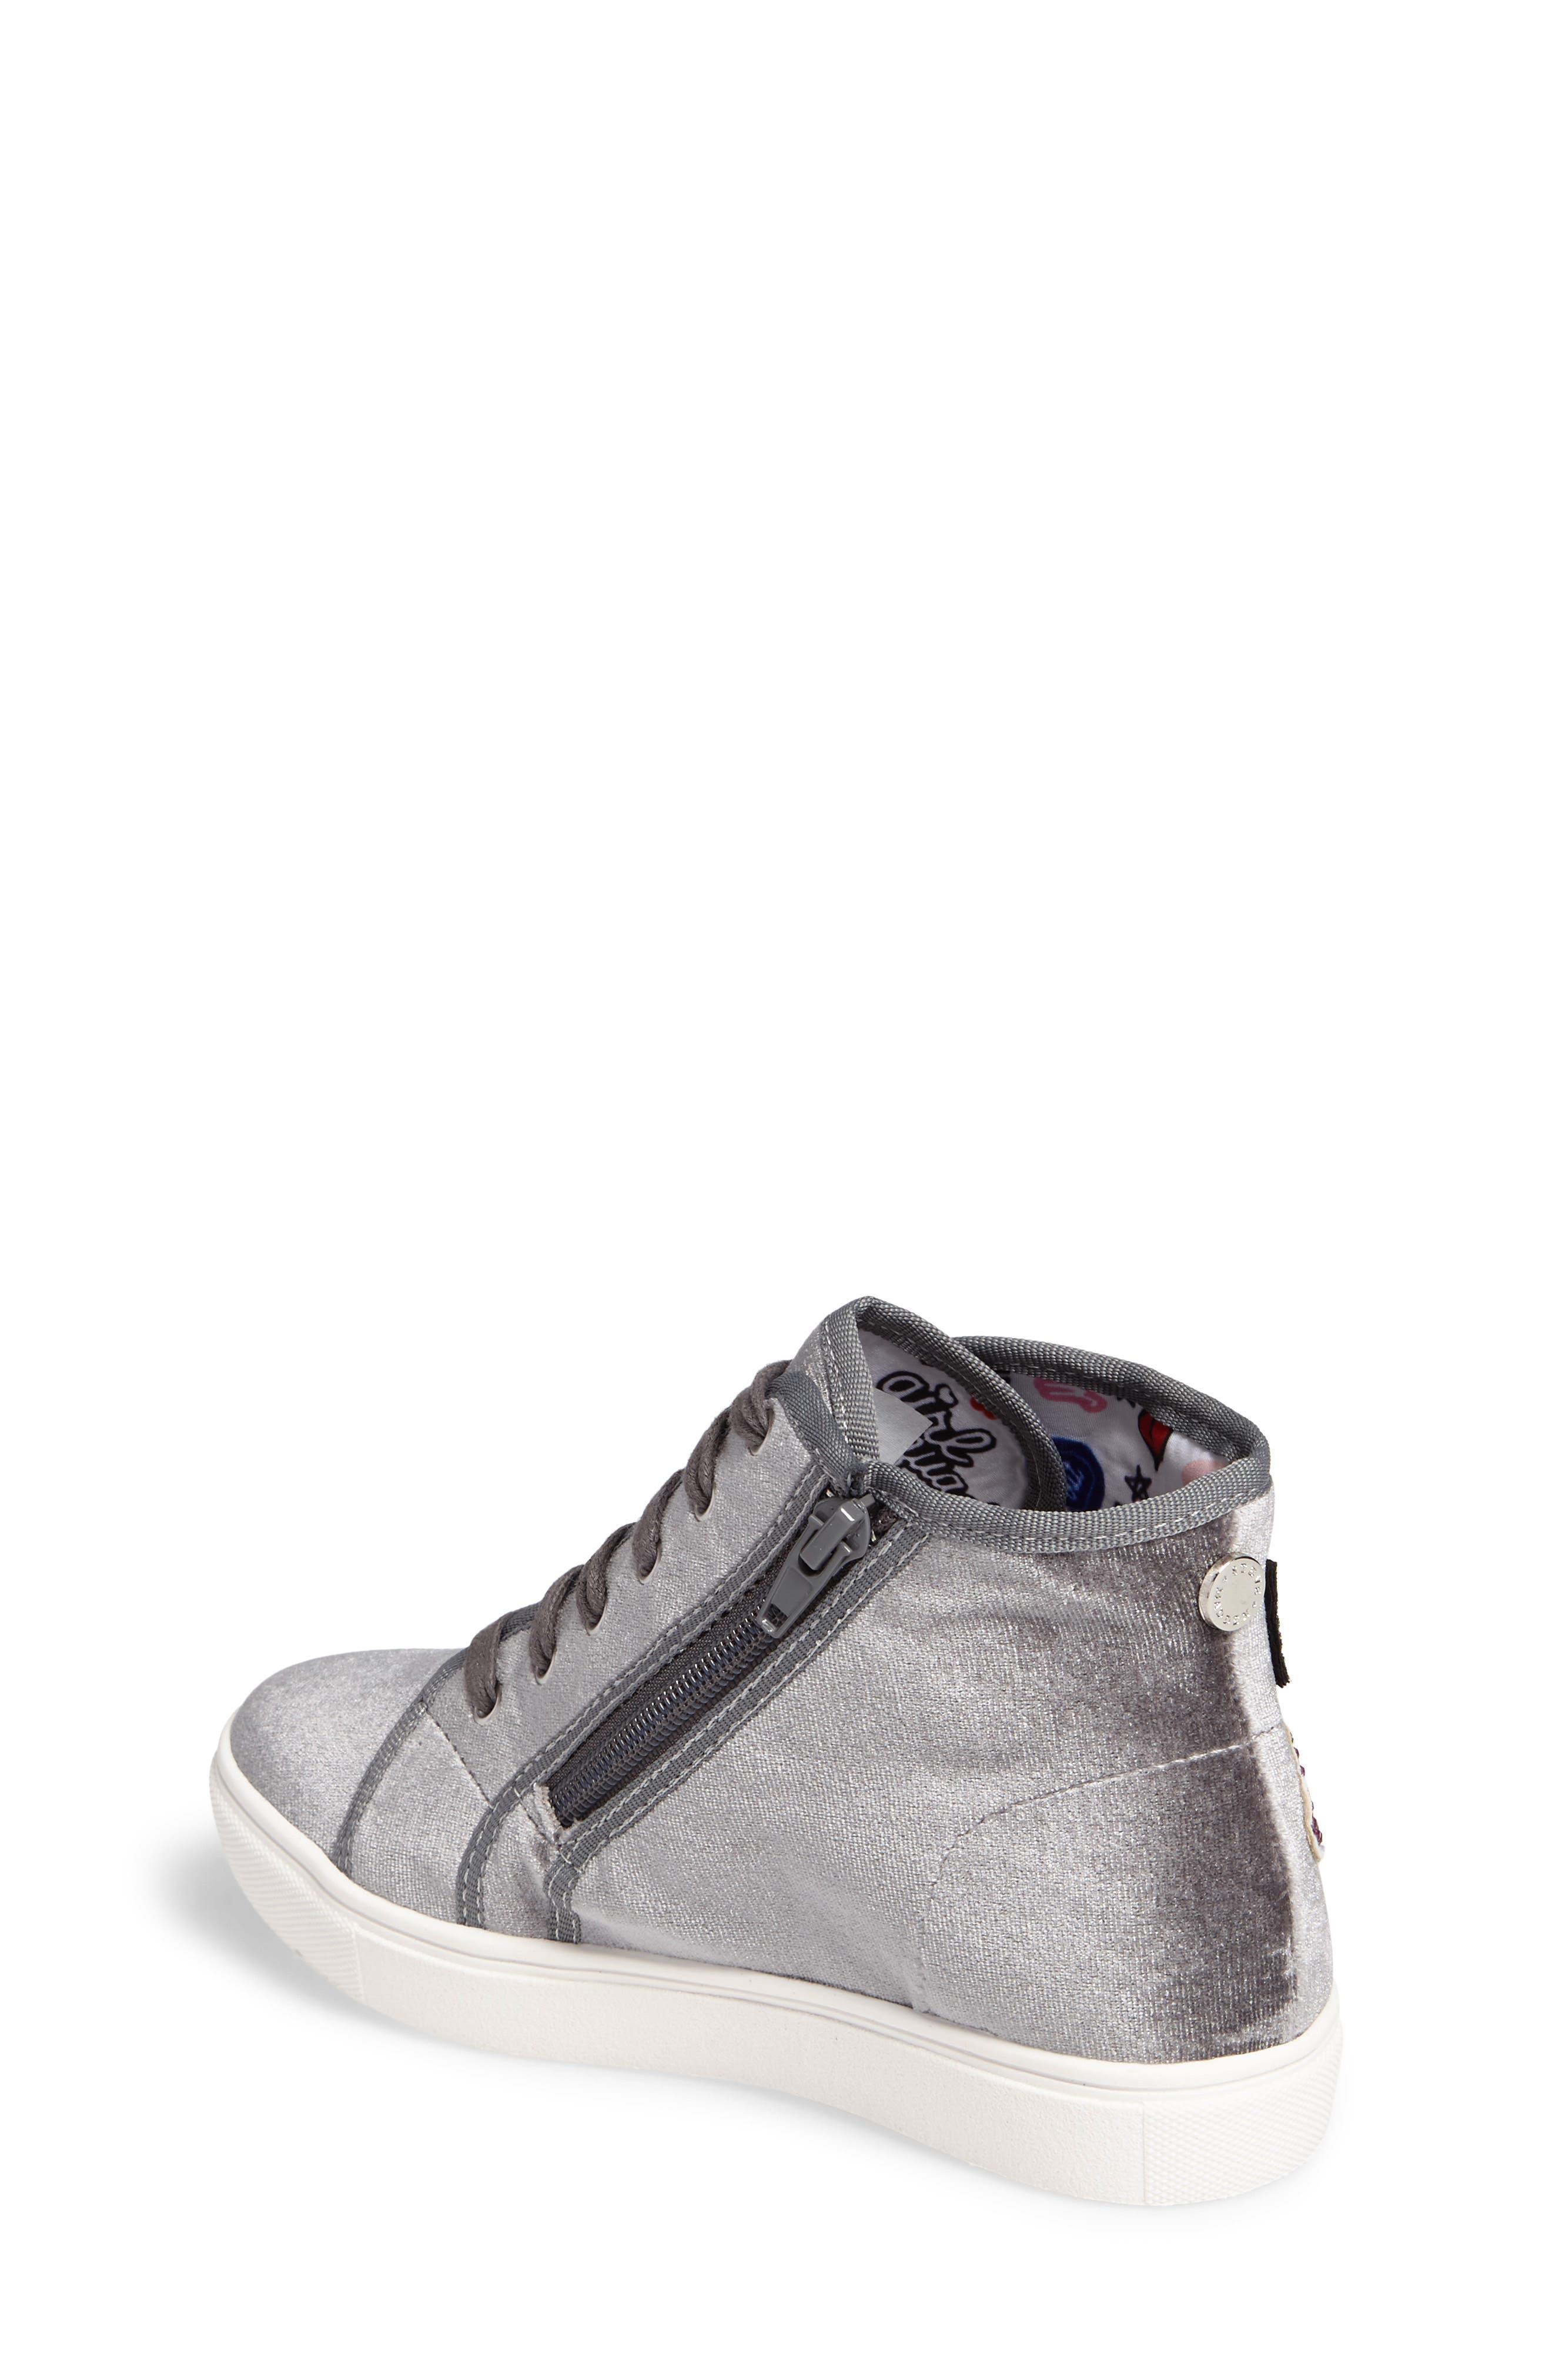 J-BFF High Top Sneaker,                             Alternate thumbnail 2, color,                             055